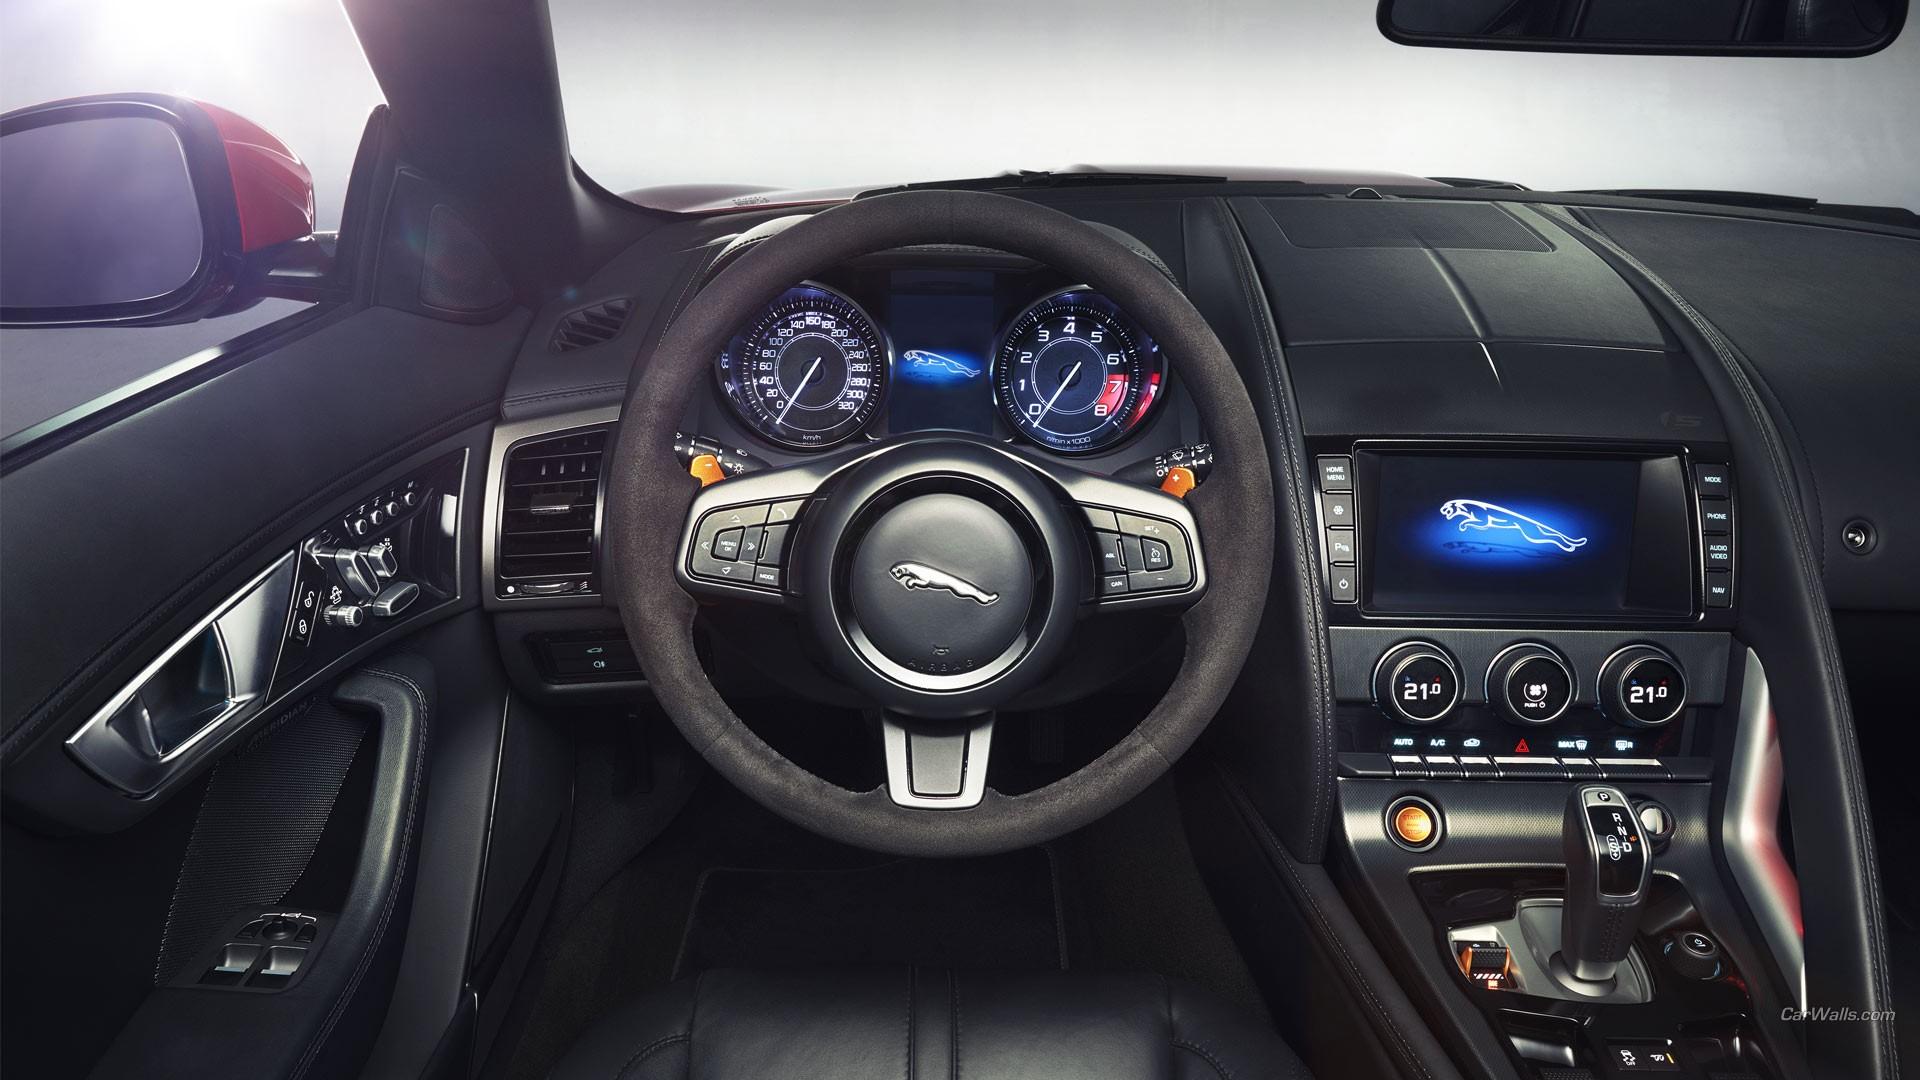 Car Vehicle Car Interior Sports Car Jaguar Car Jaguar F Type Steering Wheel  Sedan Wheel Rim